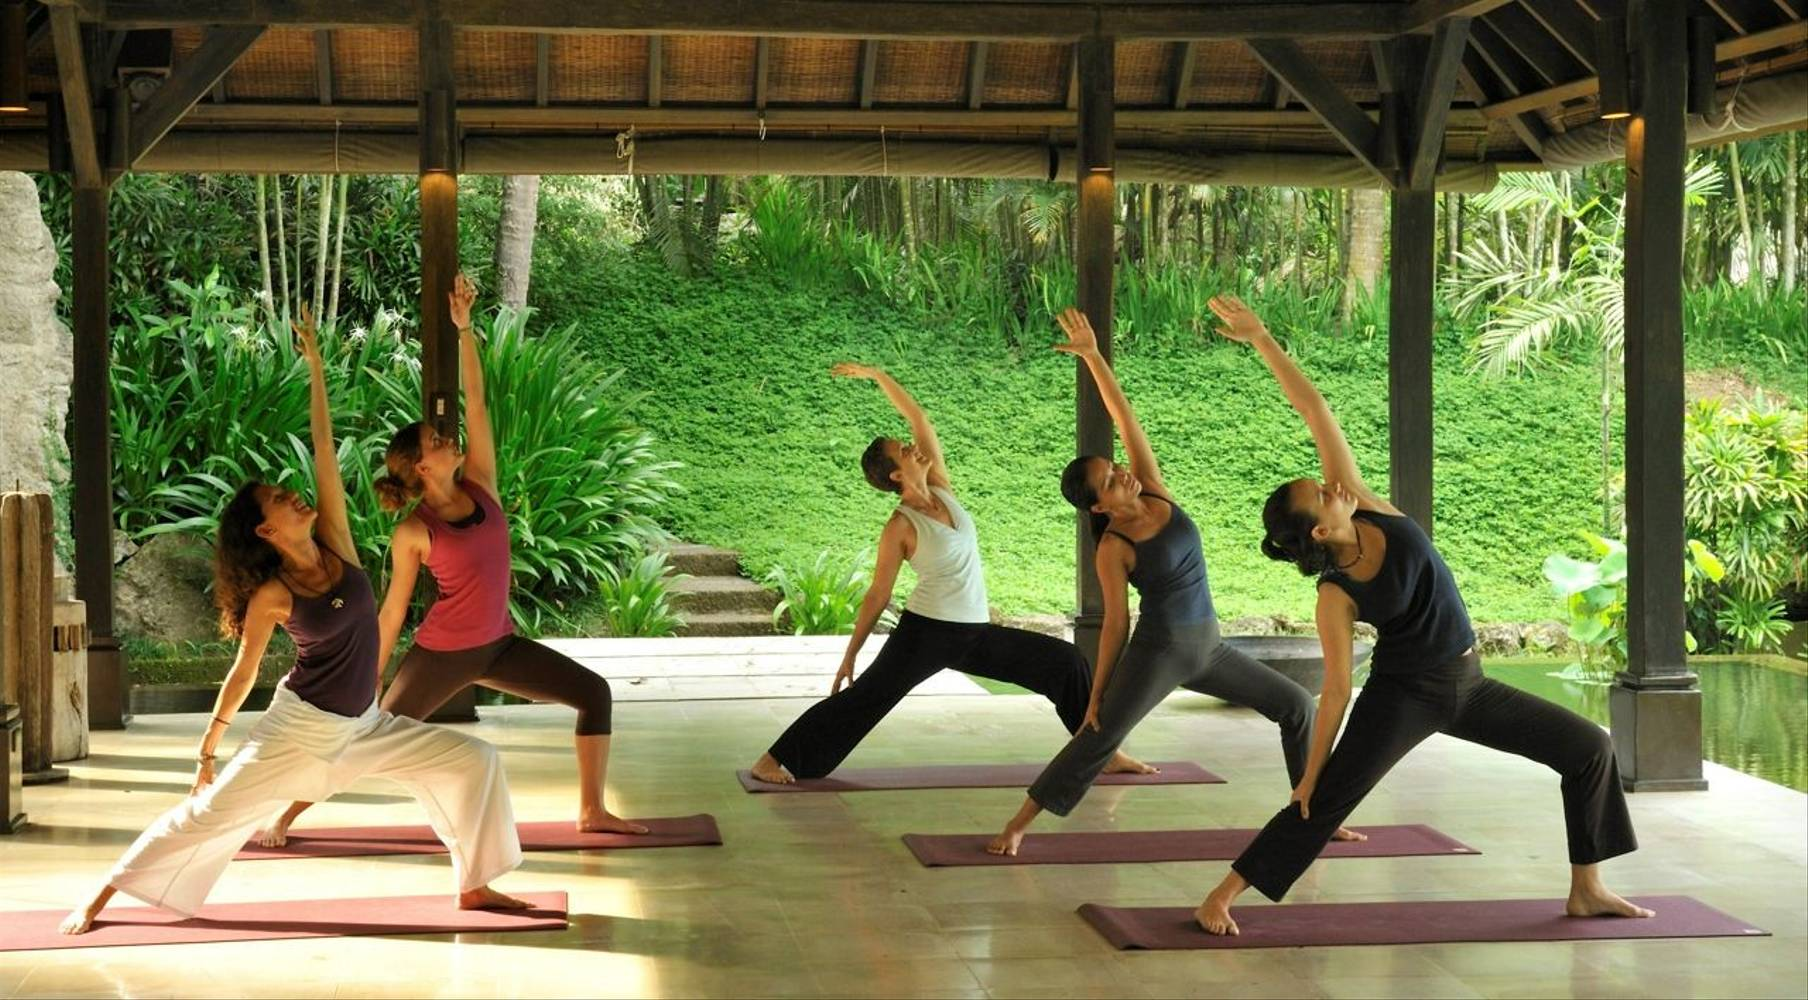 De-stress with restorative yoga at The Farm